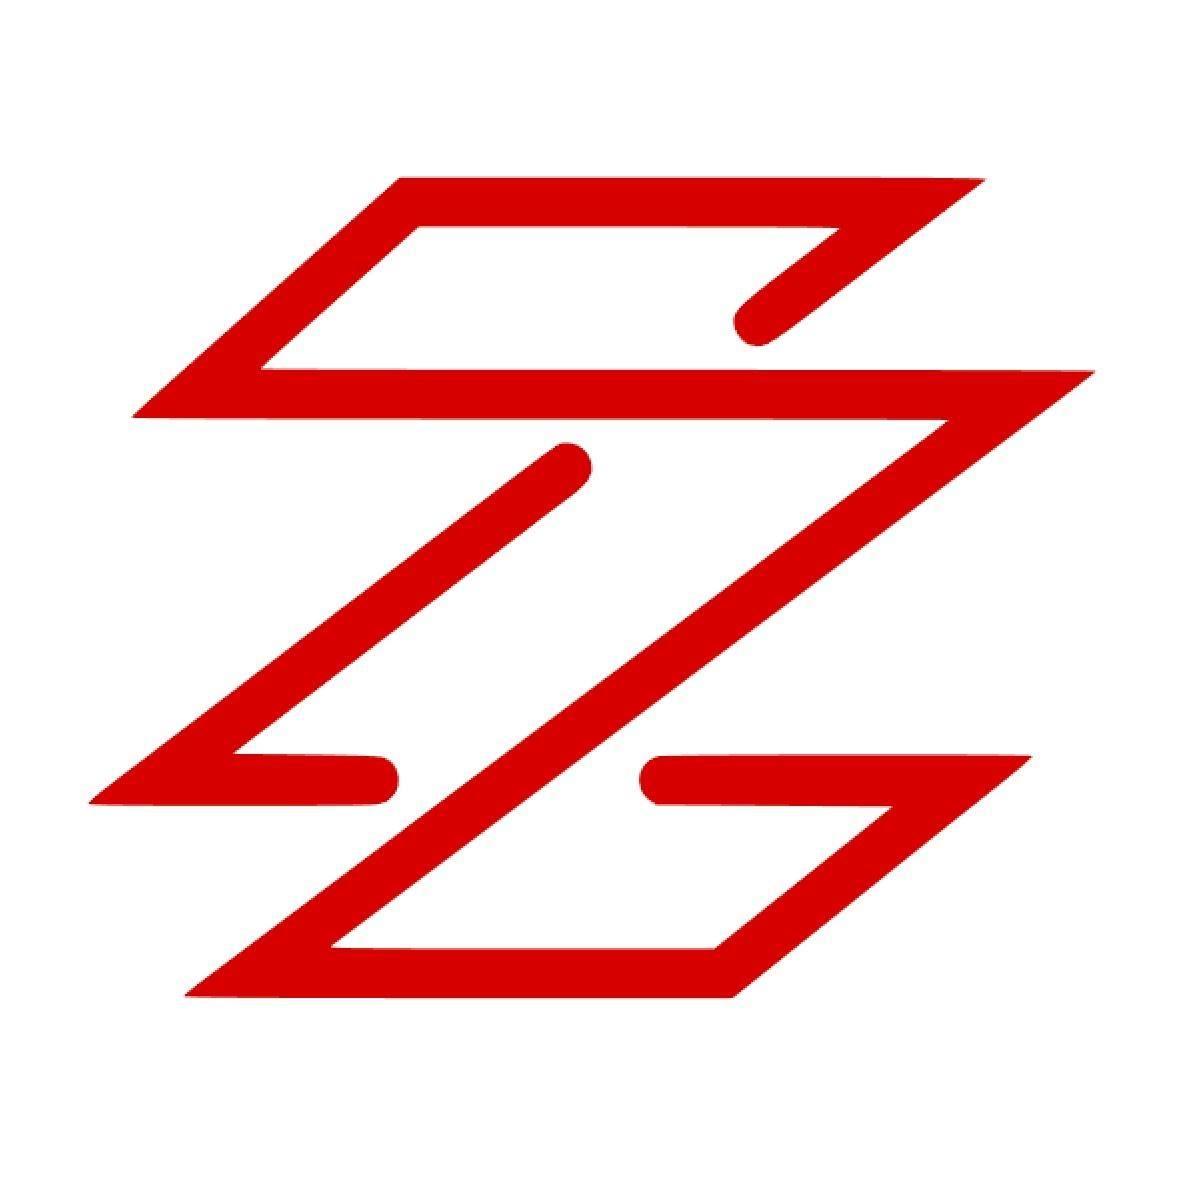 Zigcrete Constructions